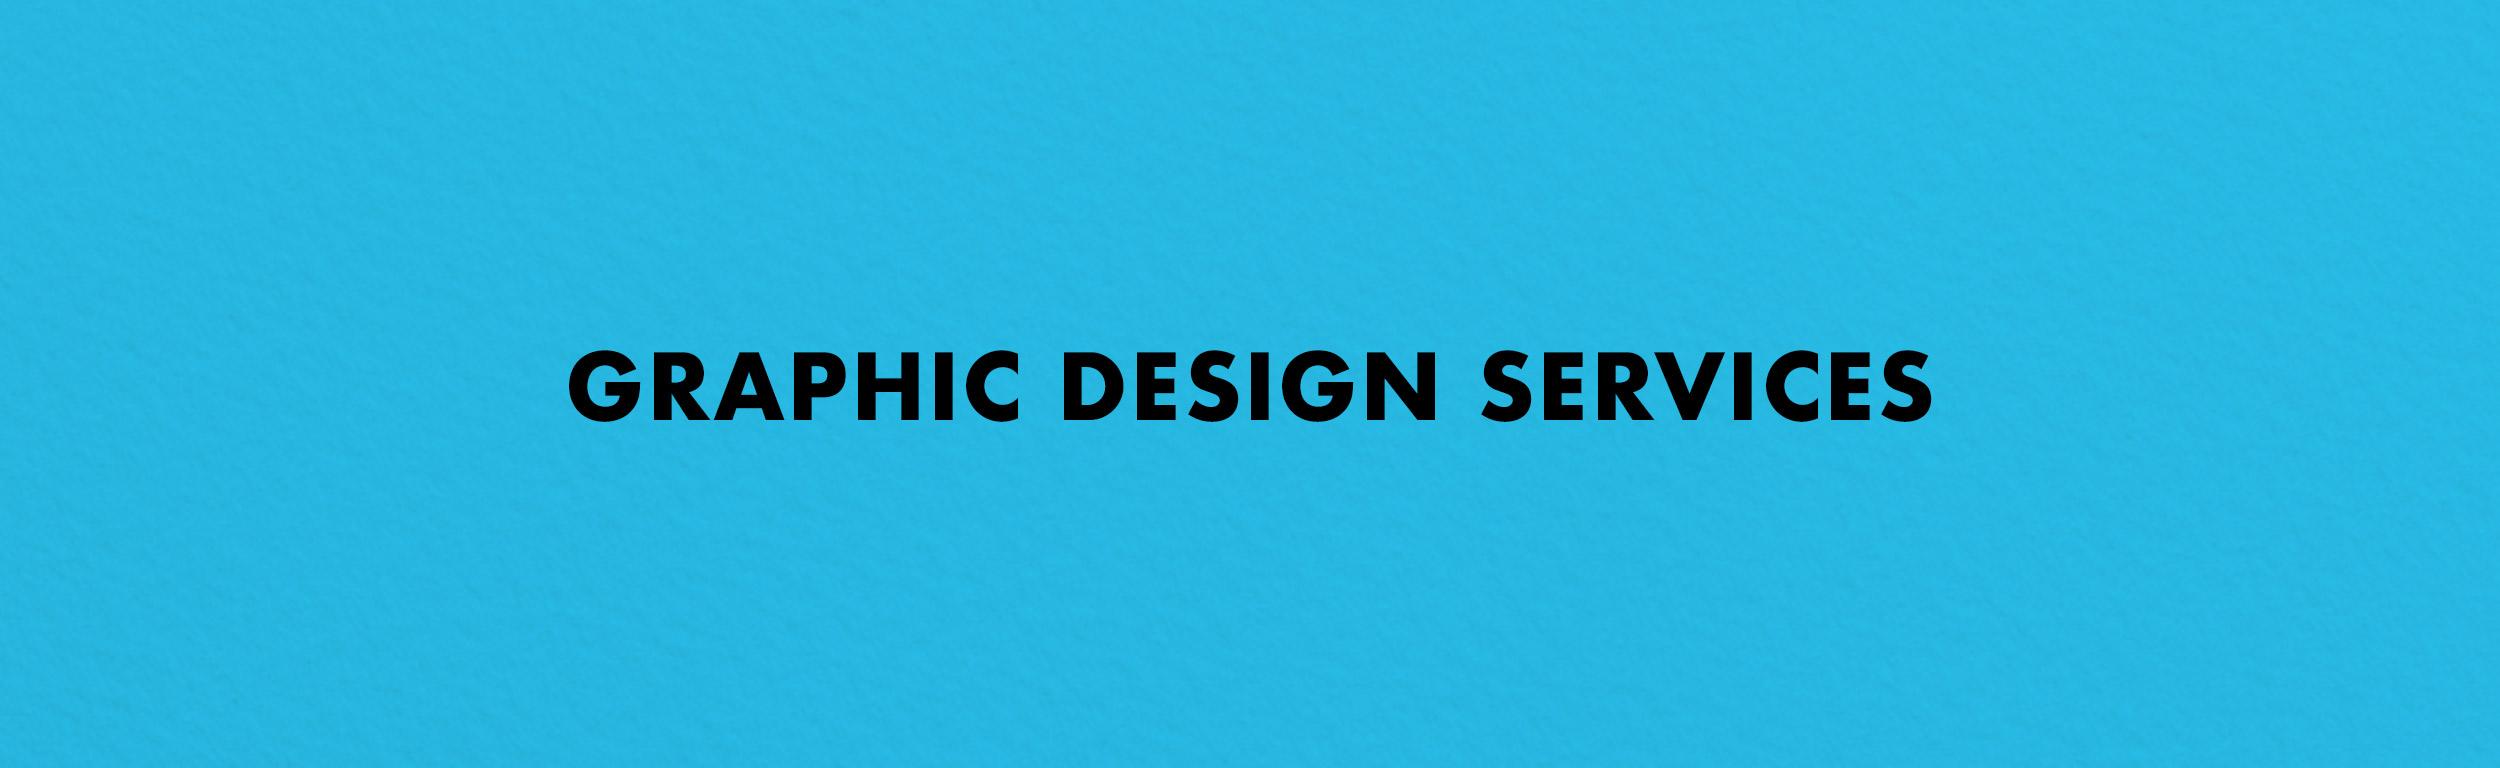 graphic_design_services1.jpg